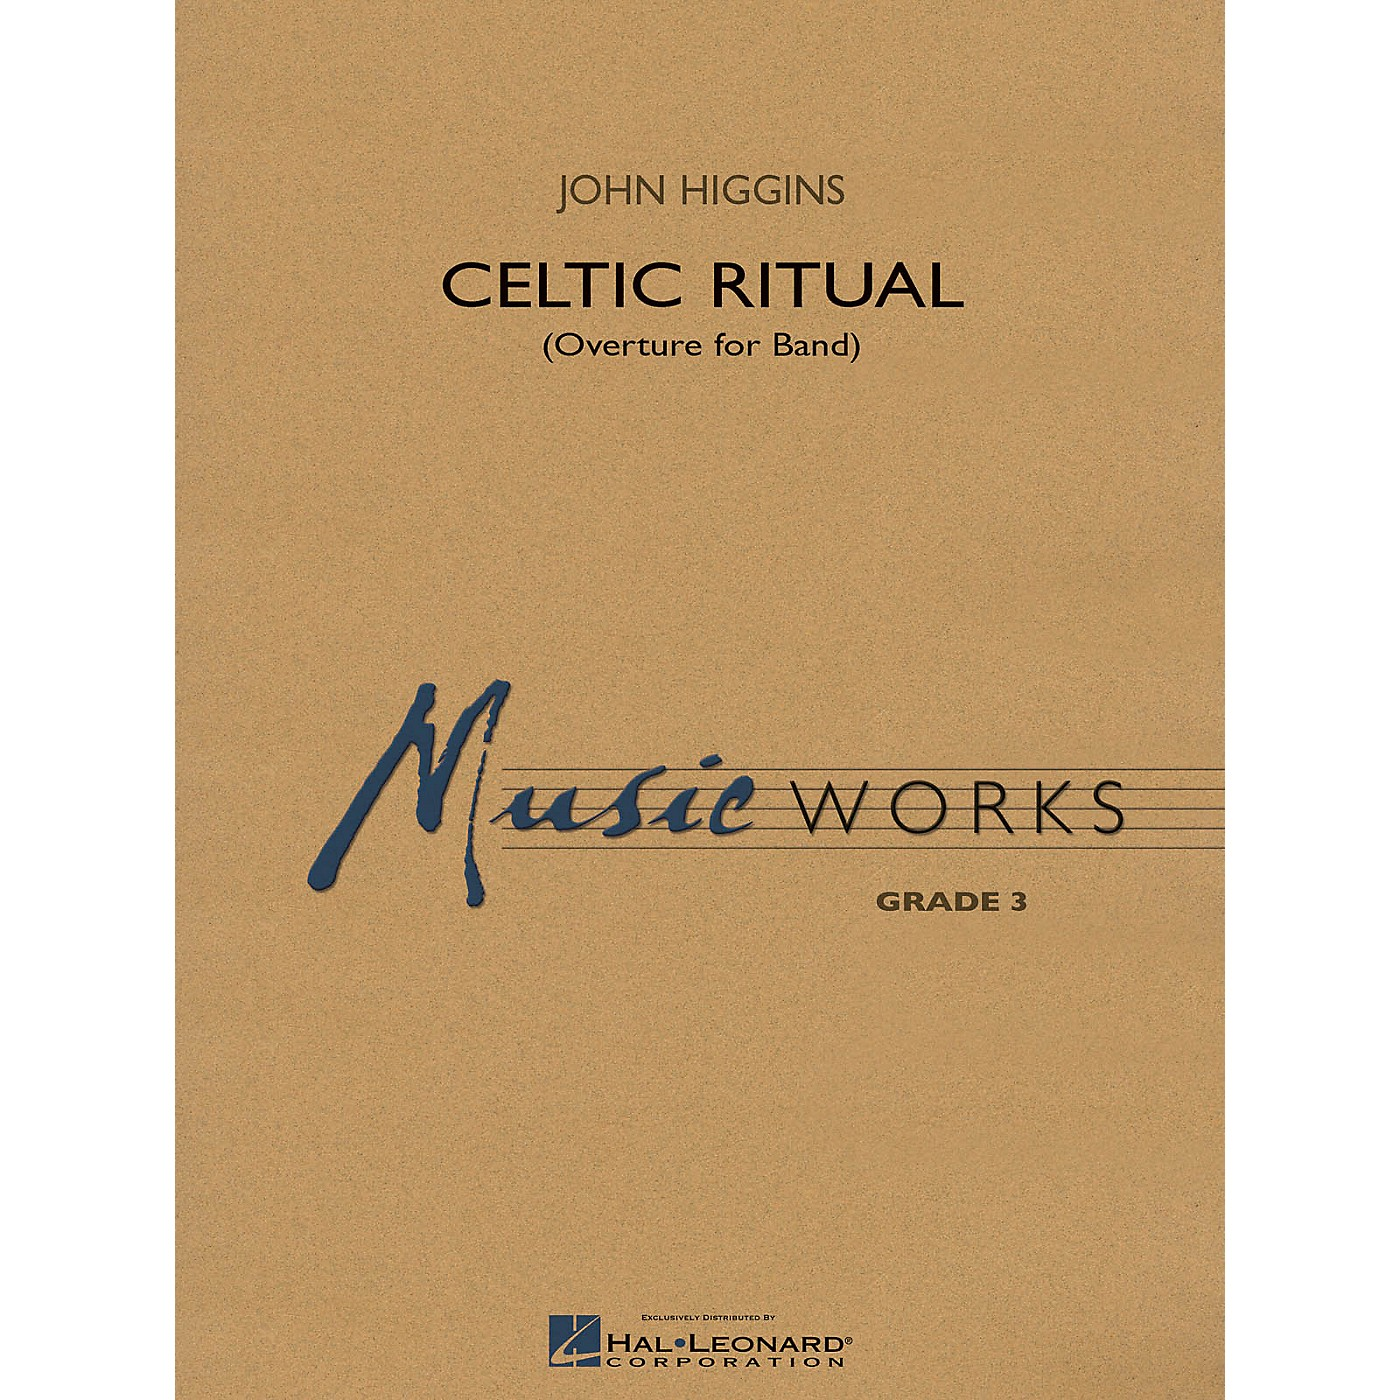 Hal Leonard Celtic Ritual (MusicWorks Grade 3) Concert Band Level 3 Composed by John Higgins thumbnail